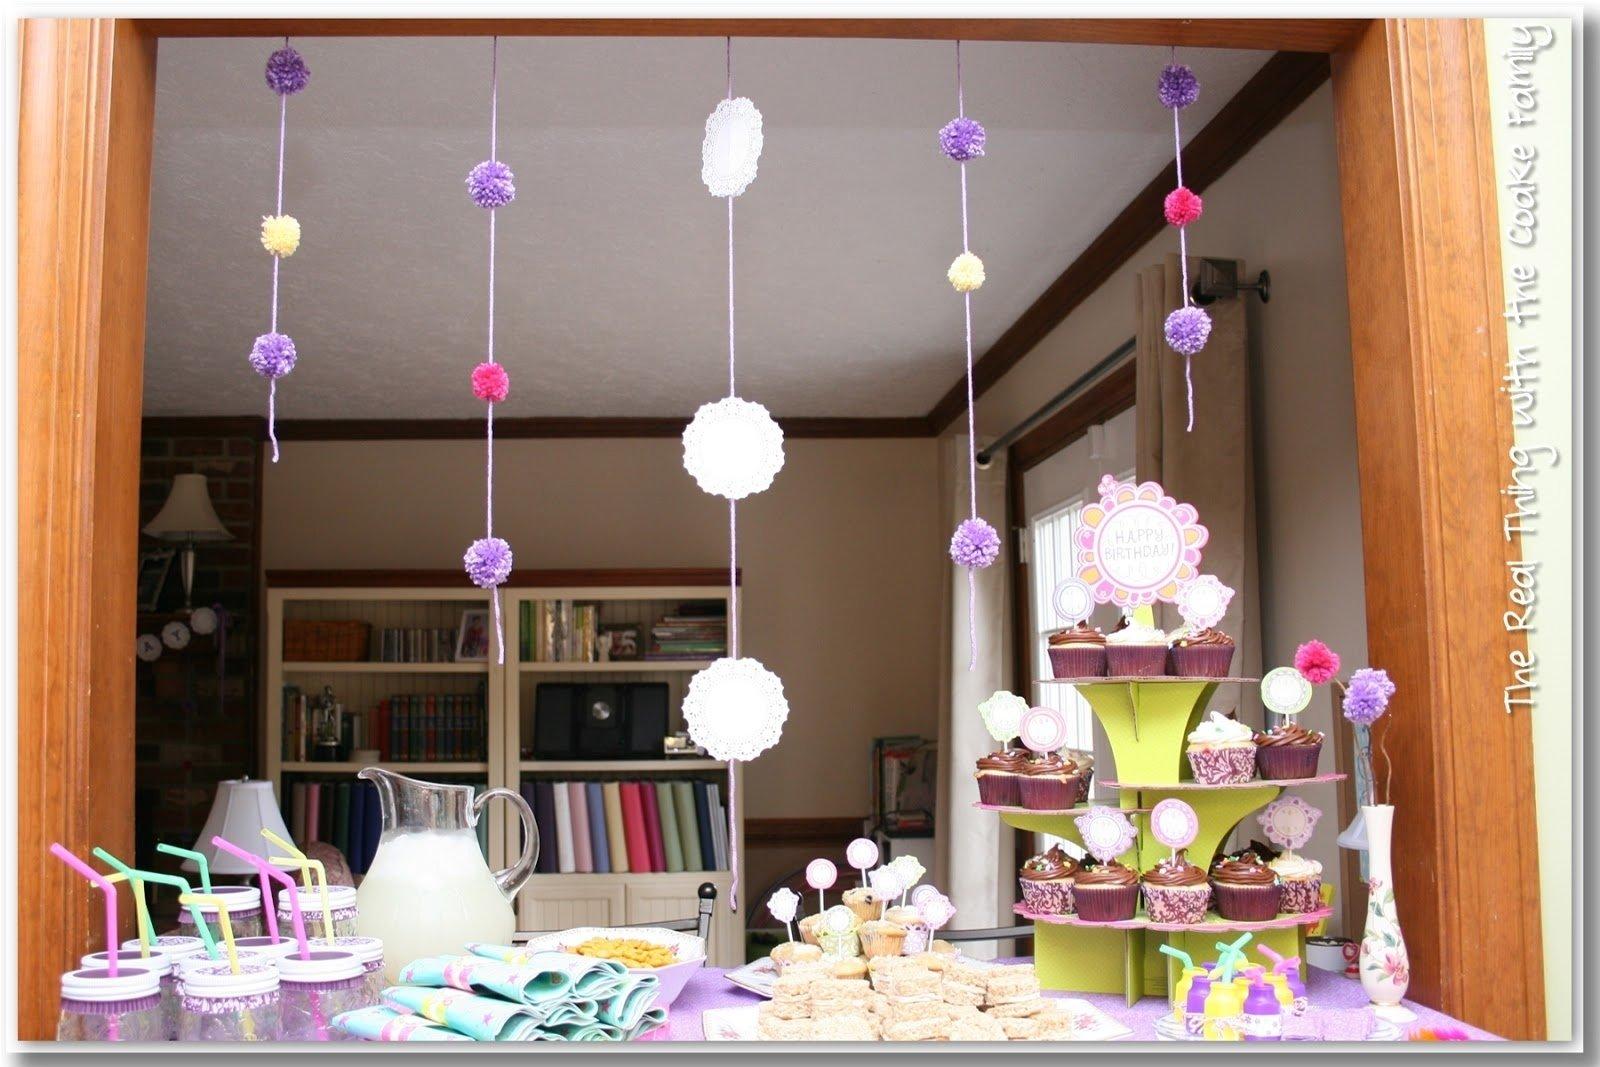 10 Great American Girl Doll Birthday Party Ideas felicity american girl birthday party party decorations 2020